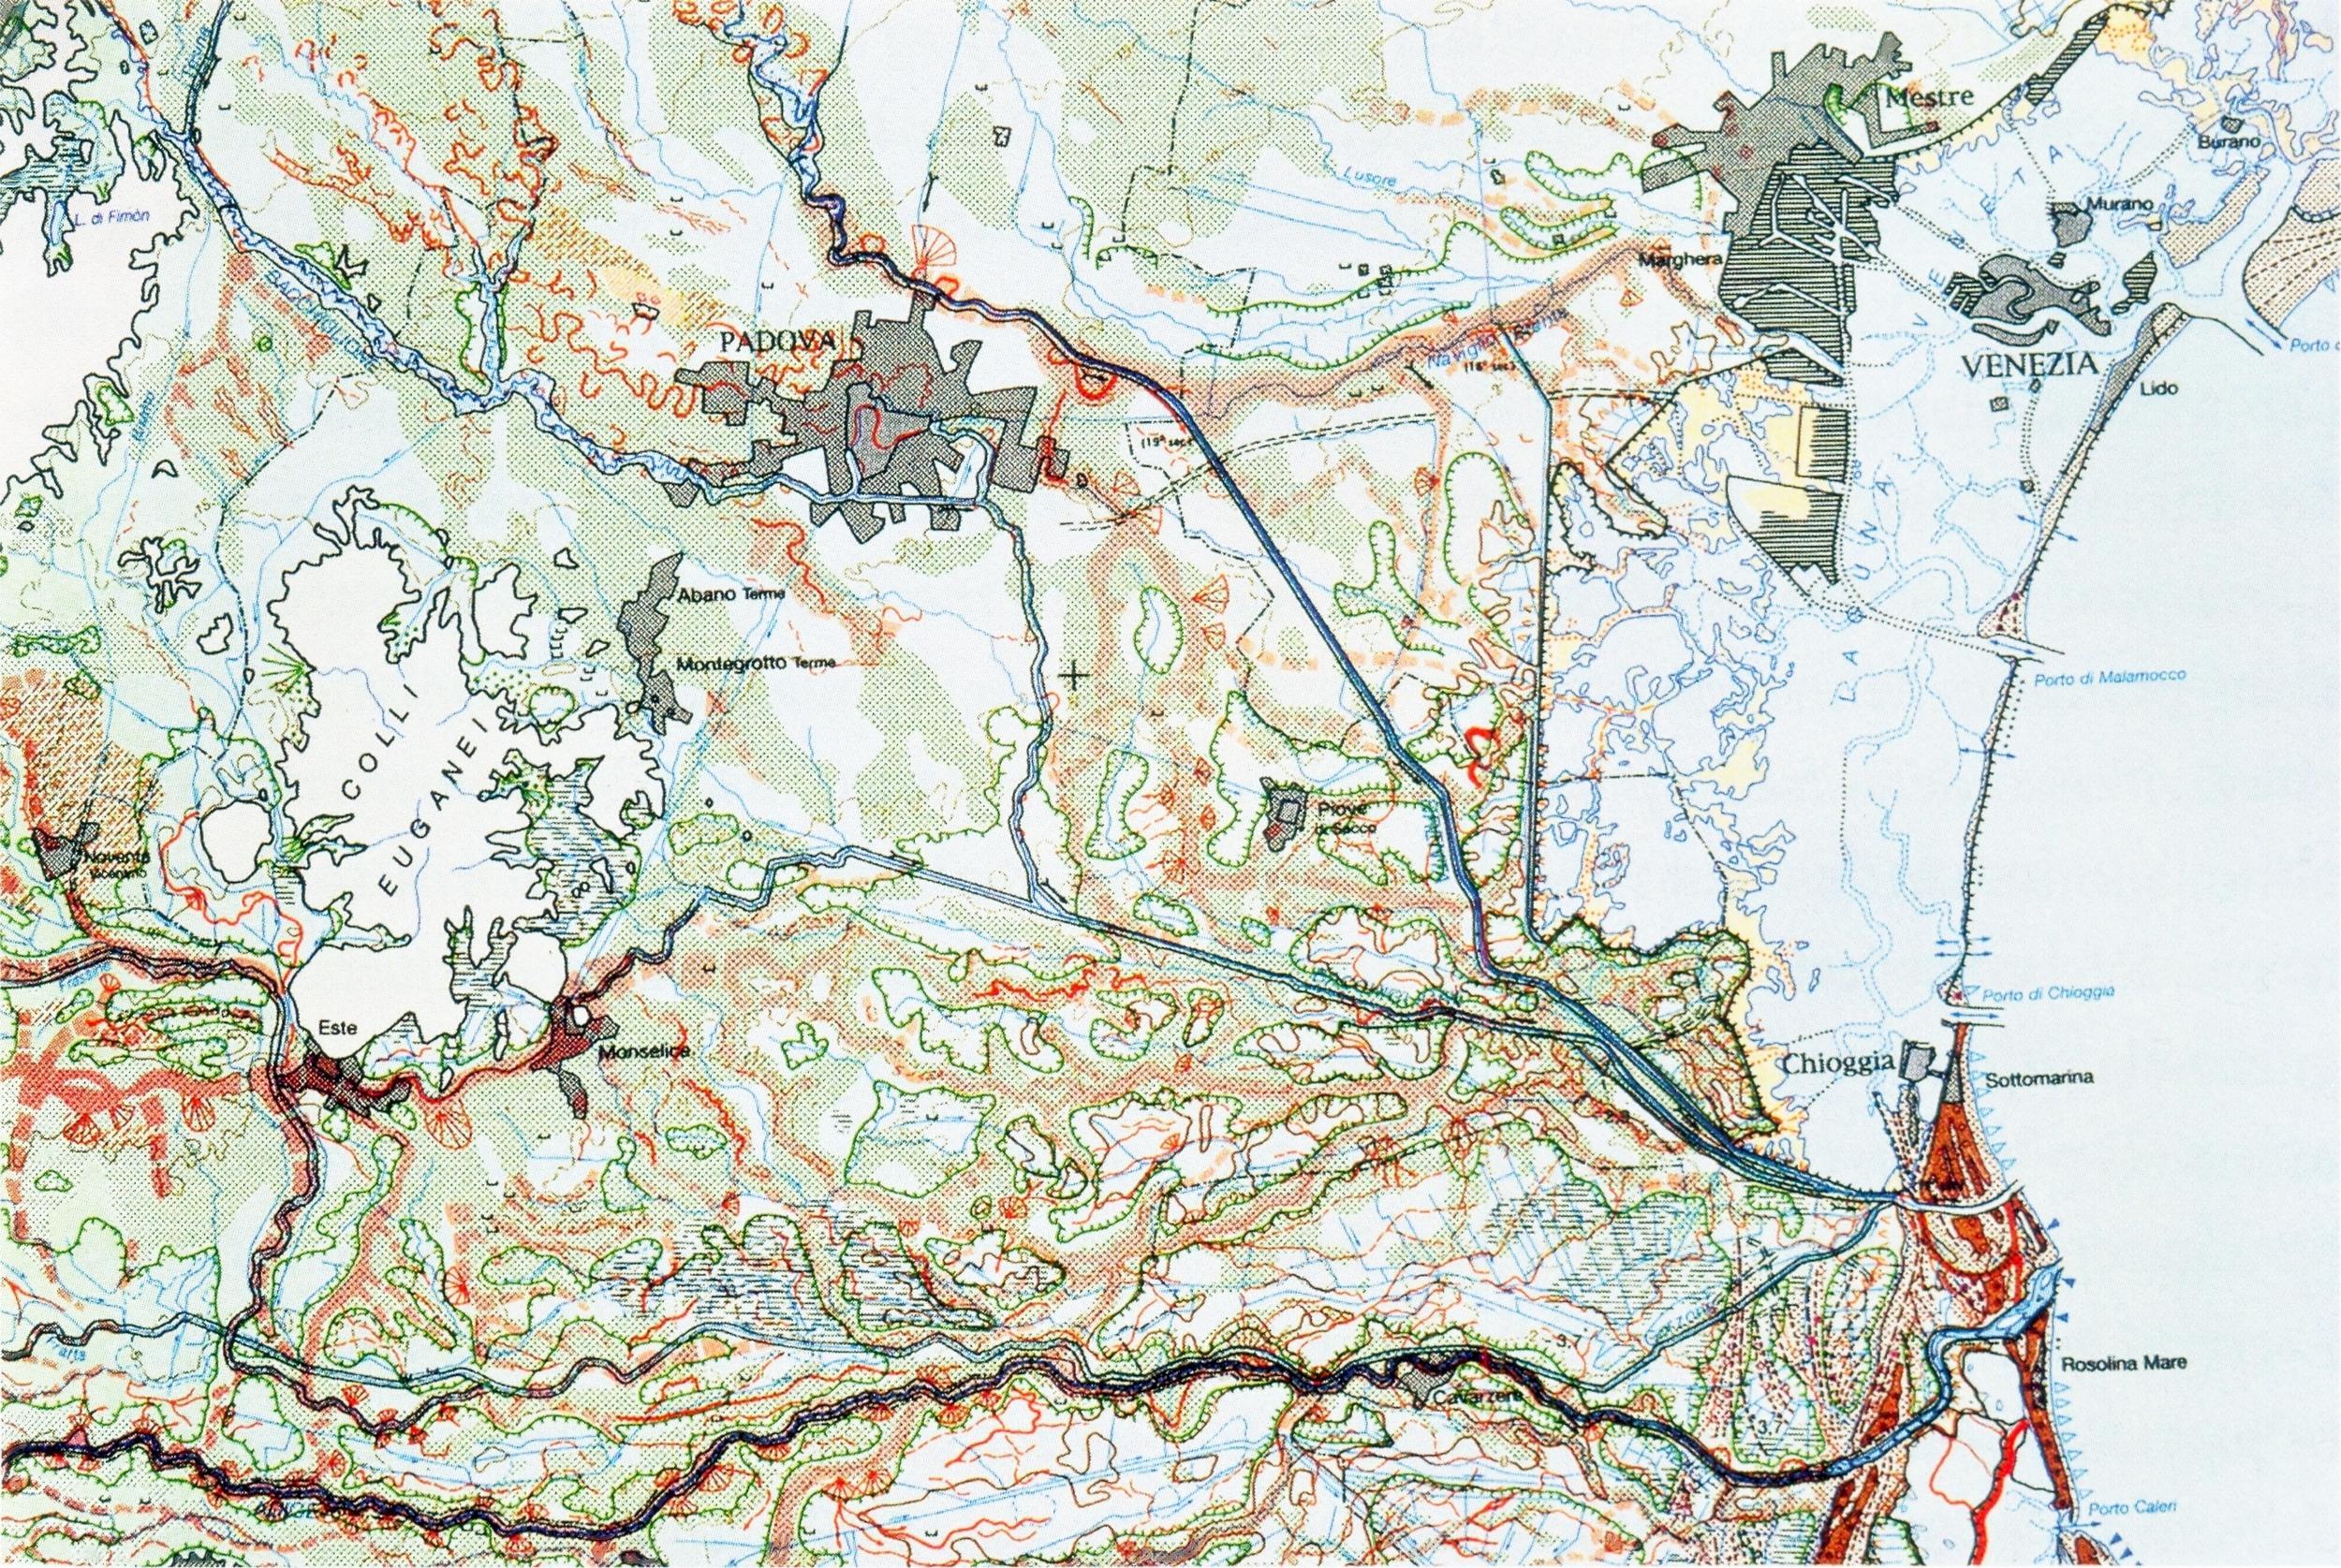 Carta geomorfologica della bassa pianura tra Colli Euganei e Laguna sud.